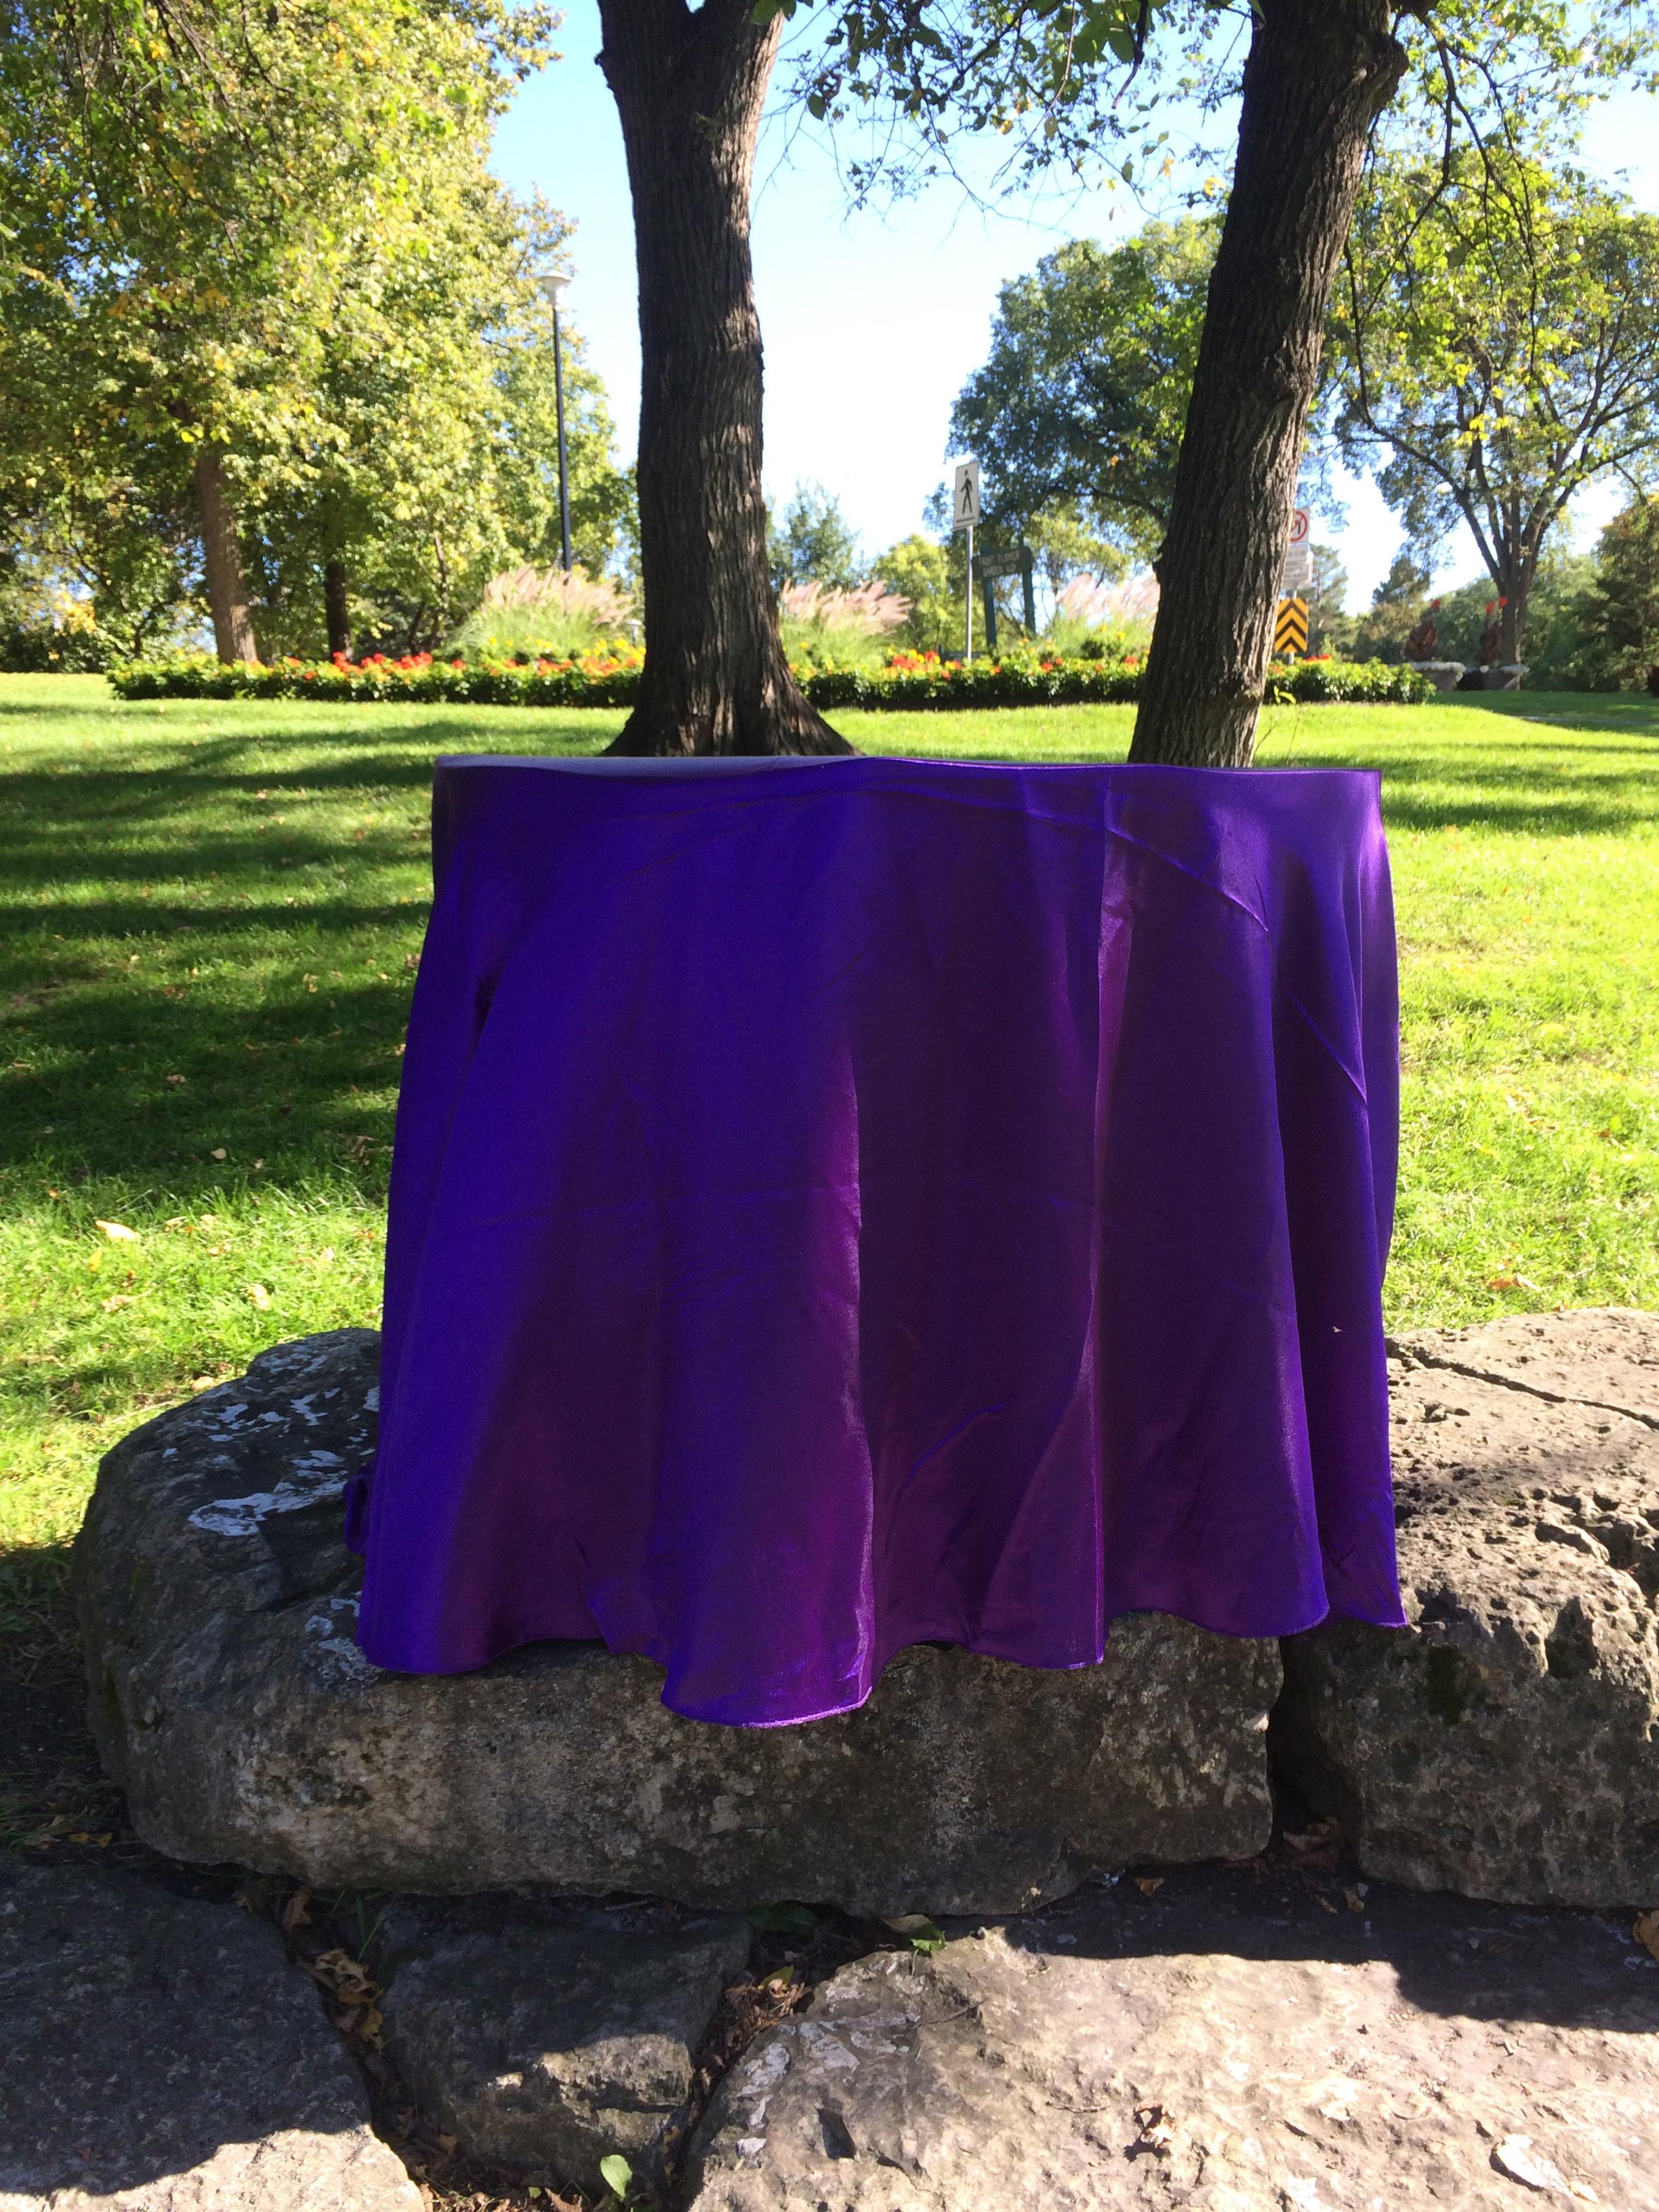 PURPLE SATIN TABLE CLOTH